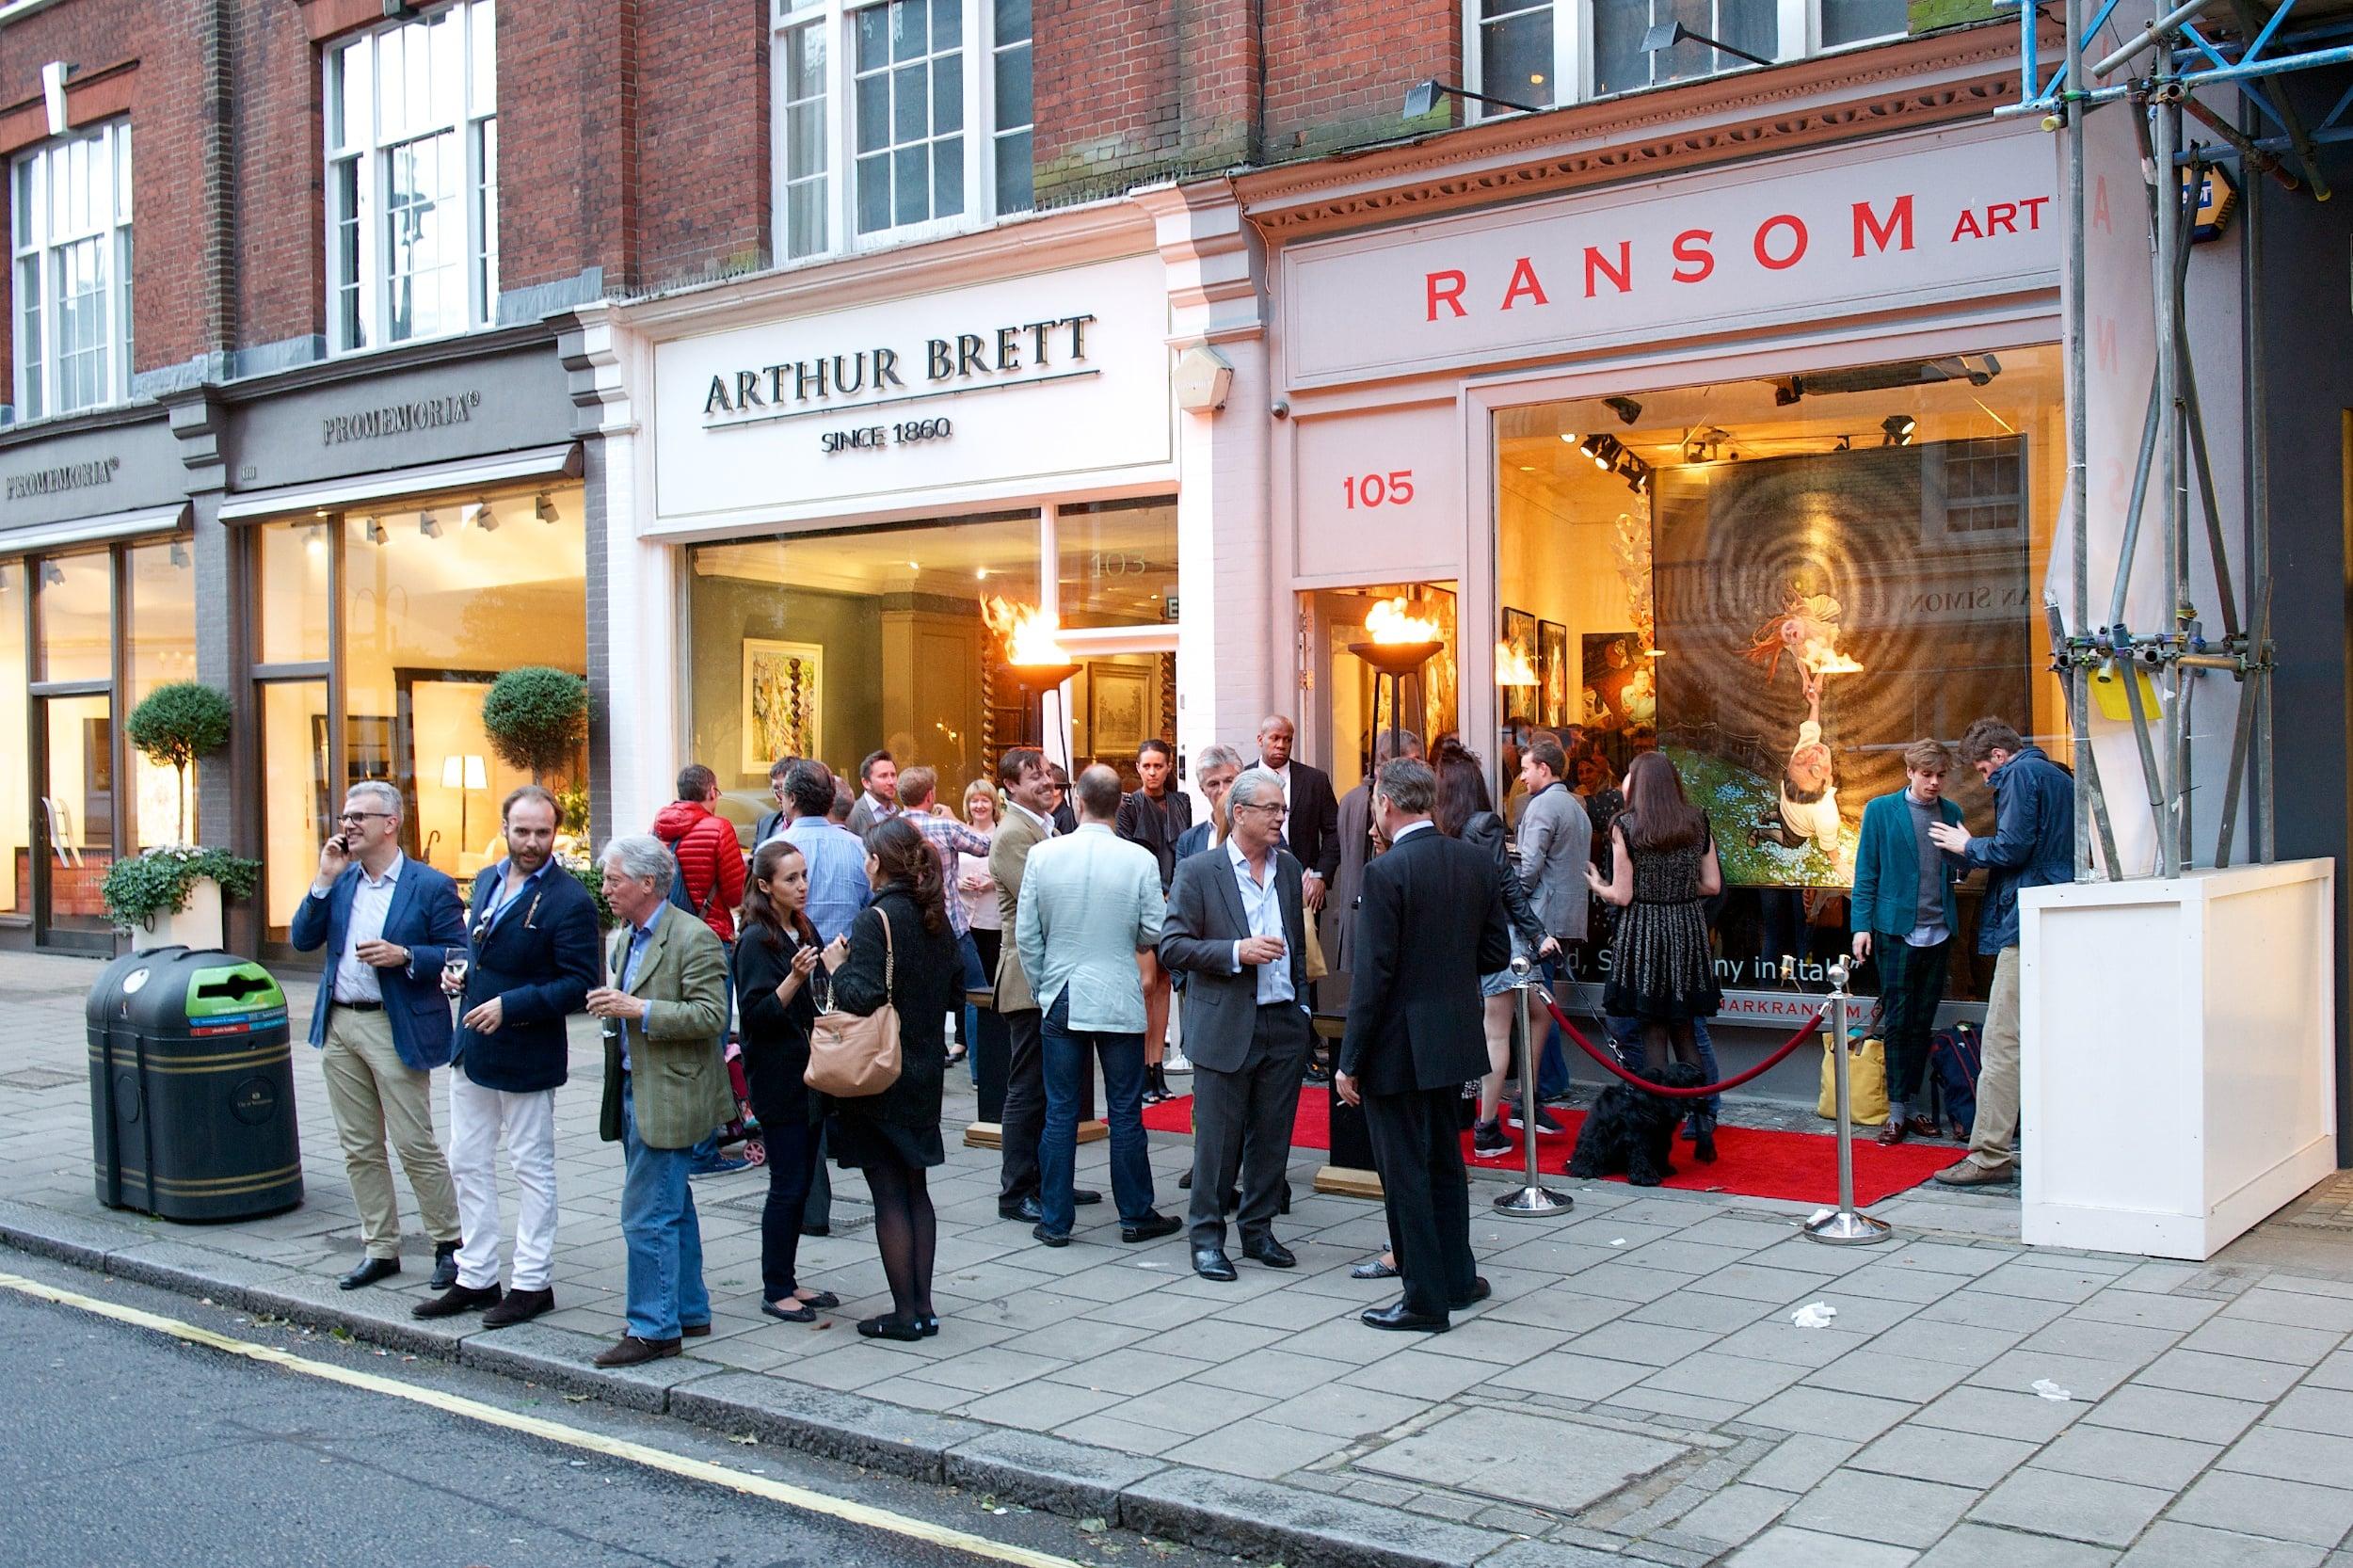 4-exhibition-photo-enrico-robusti-ransom-art-gallery-min.jpg